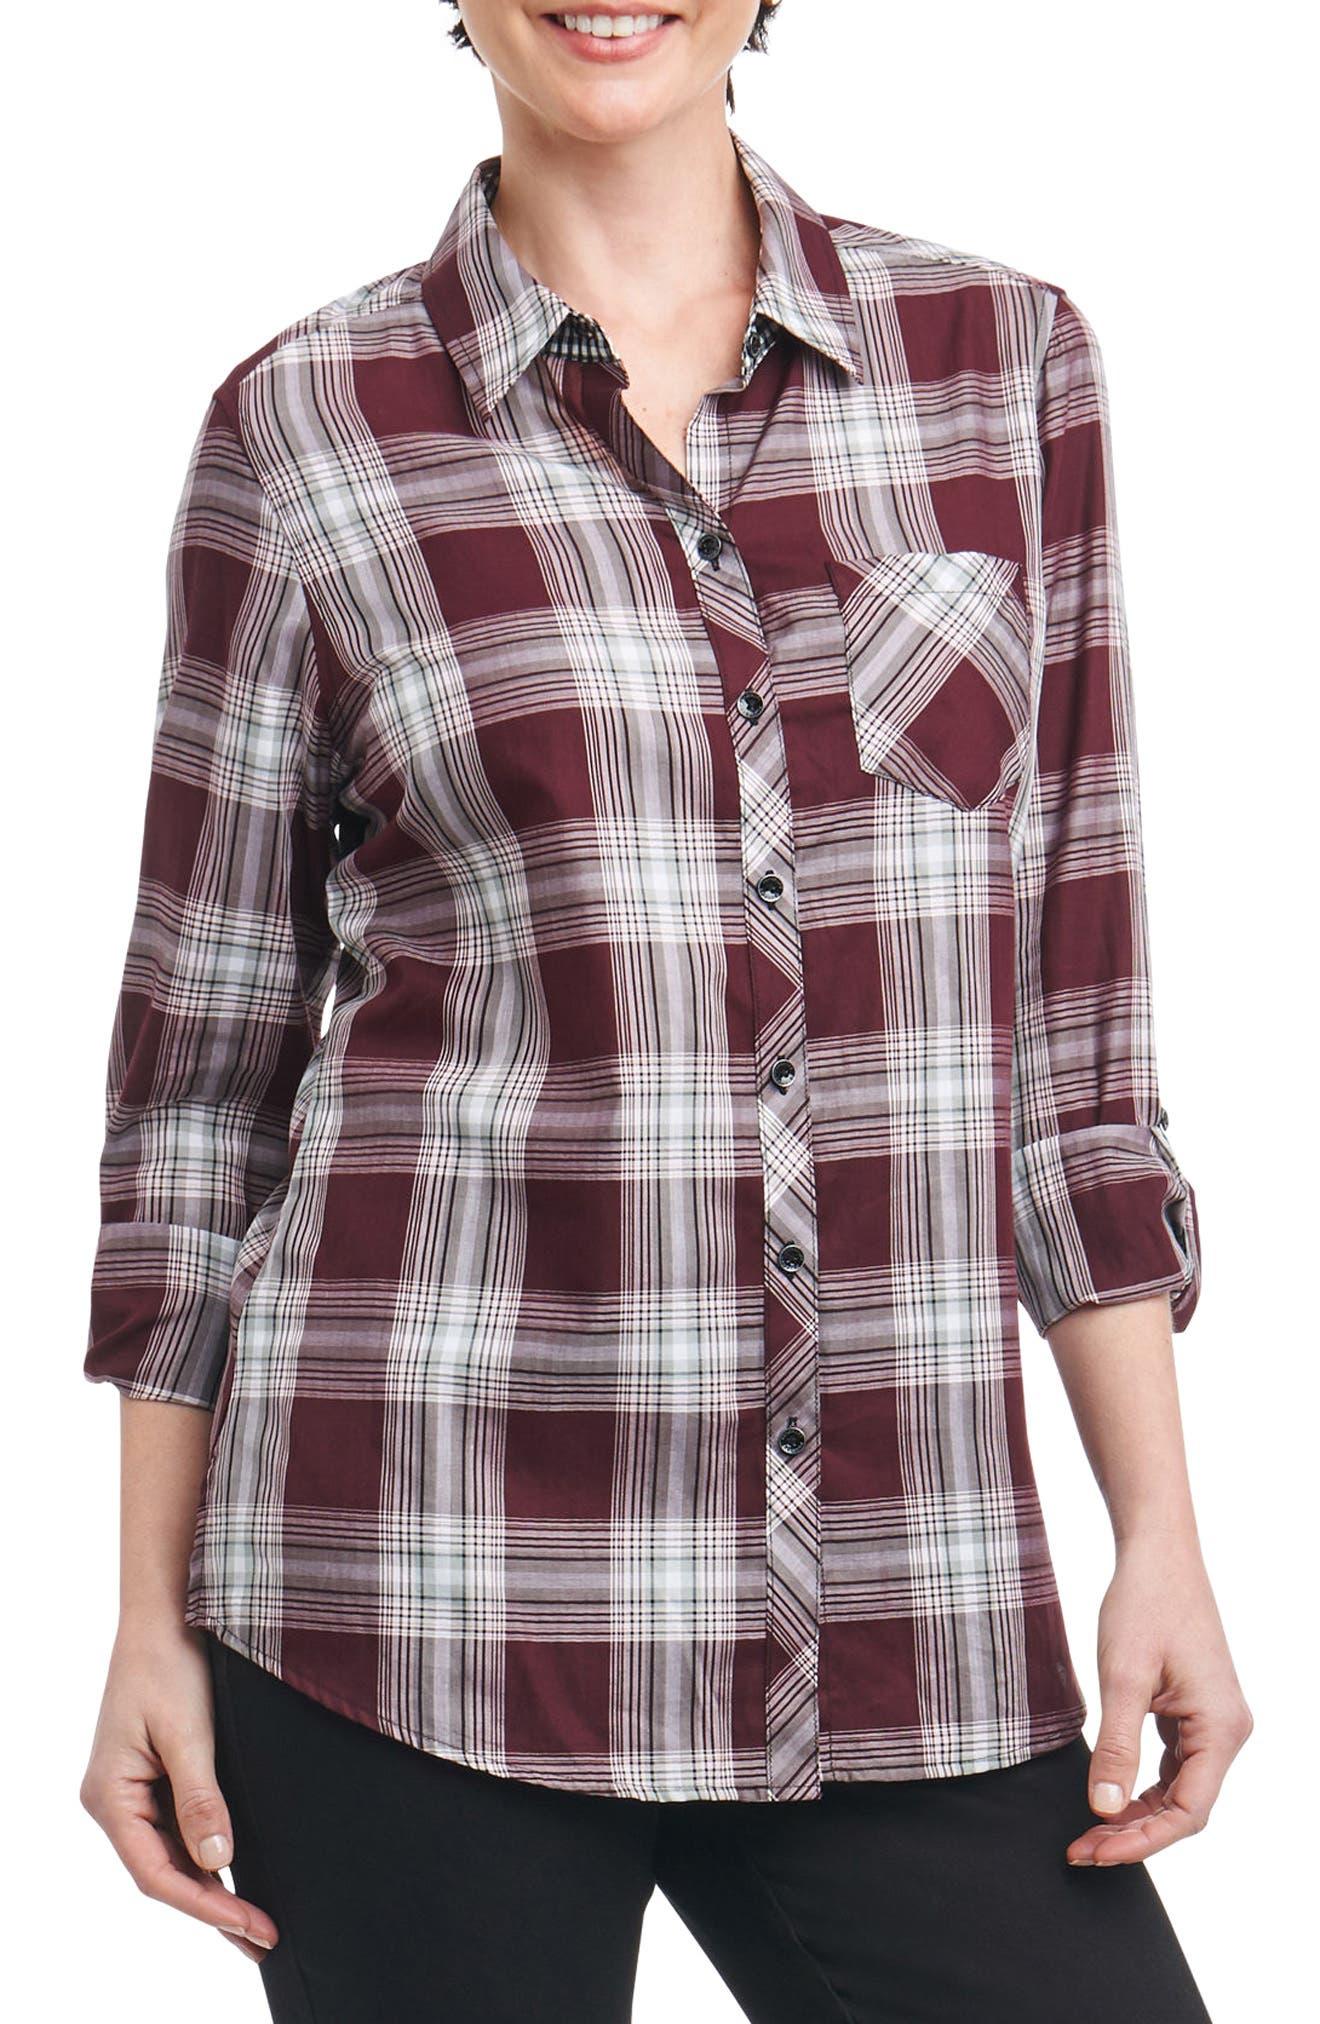 Foxcroft Addison Plaid Shirt (Regular & Petite)